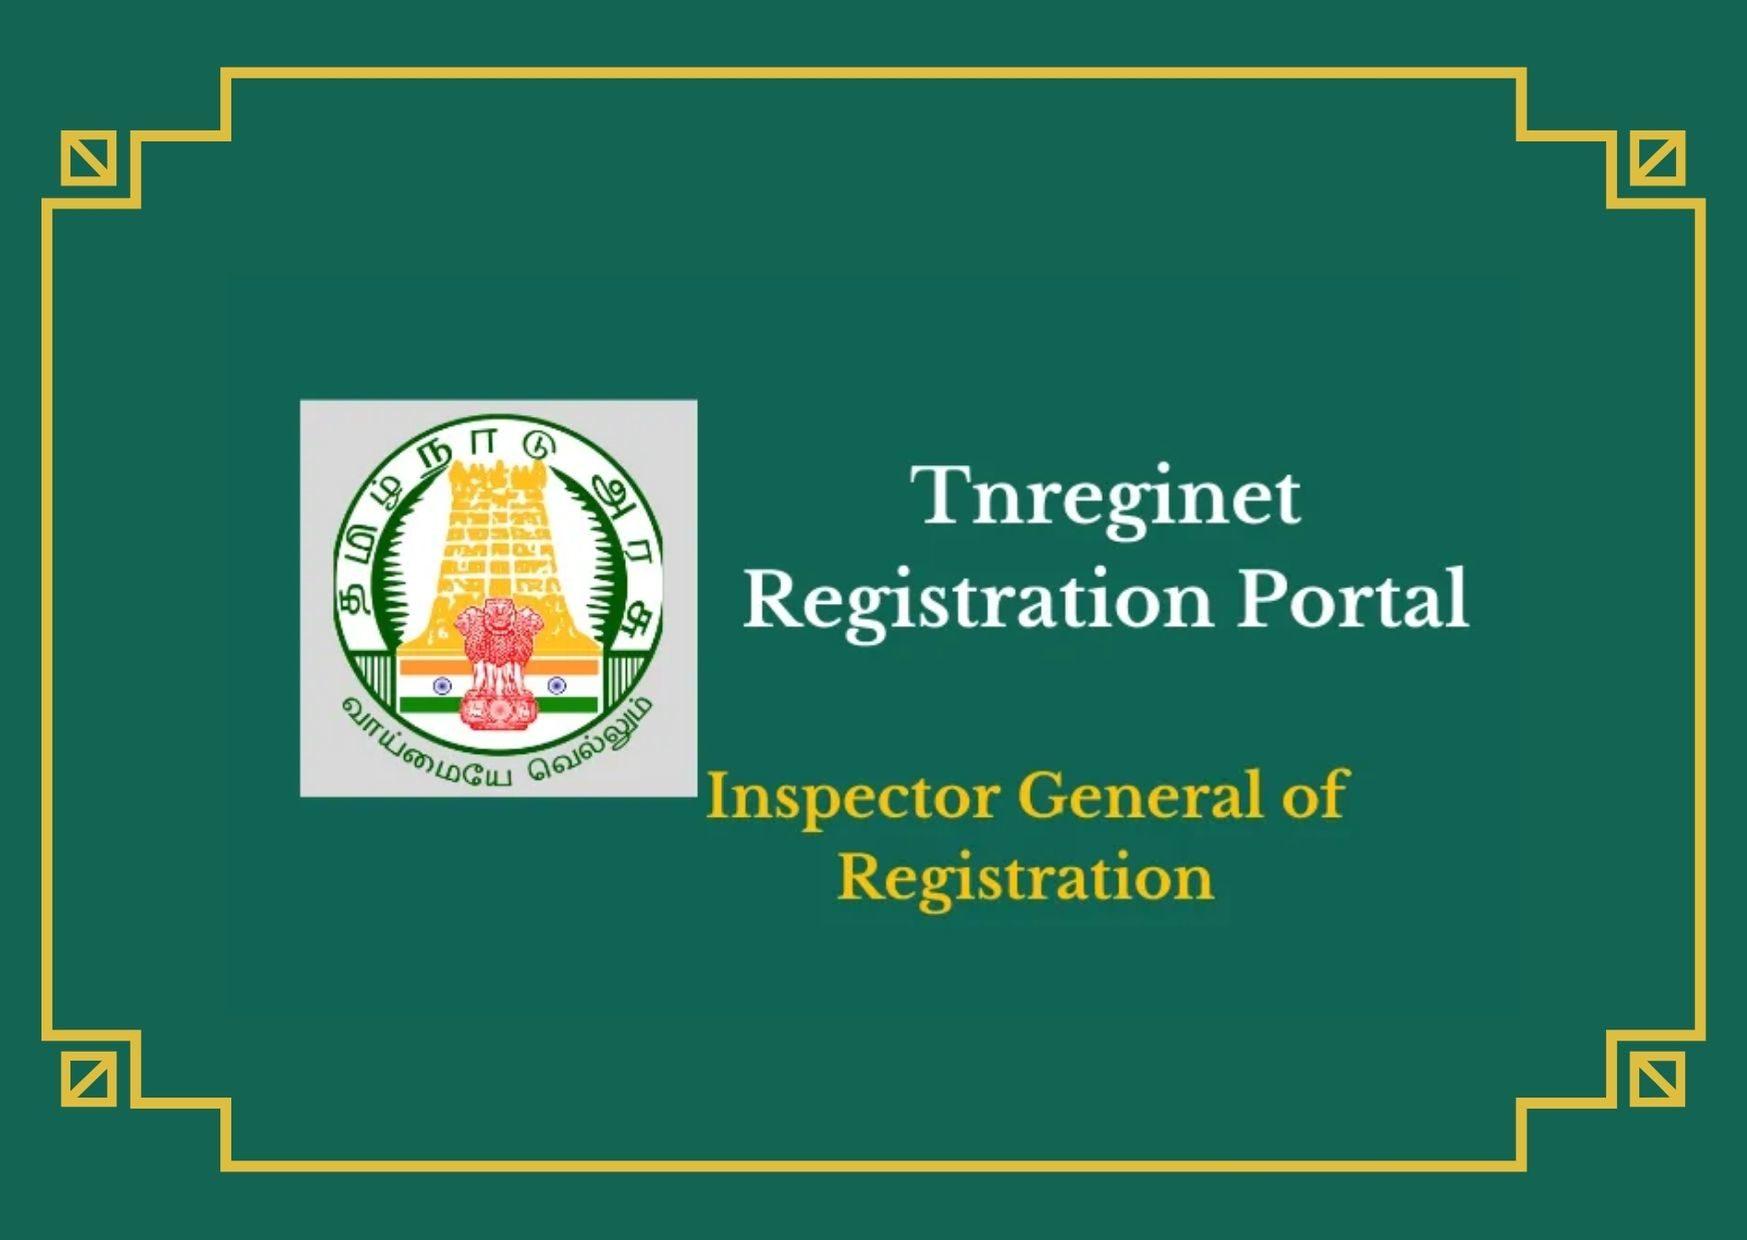 TNREGINET Registration | EC View | Giudline value tnreginet.gov.in